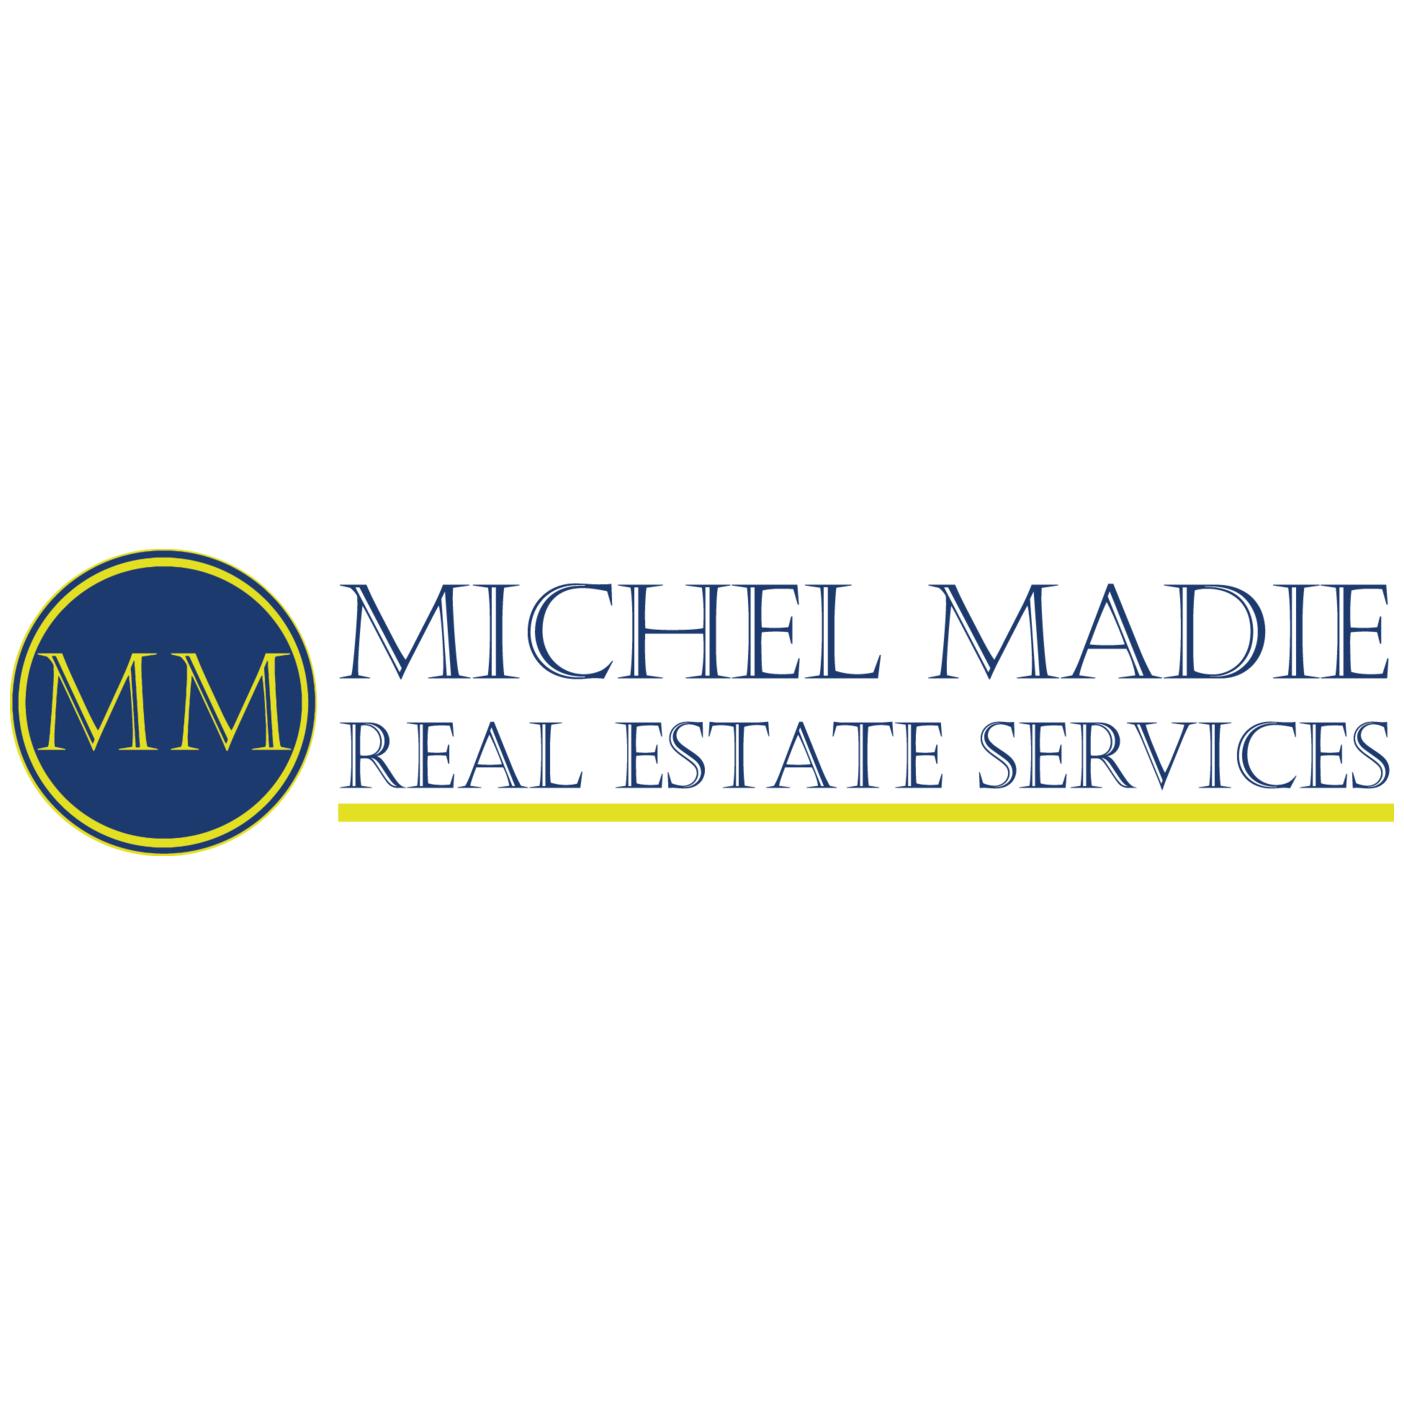 Matthew Bajek - Michel Madie Real Estate Services